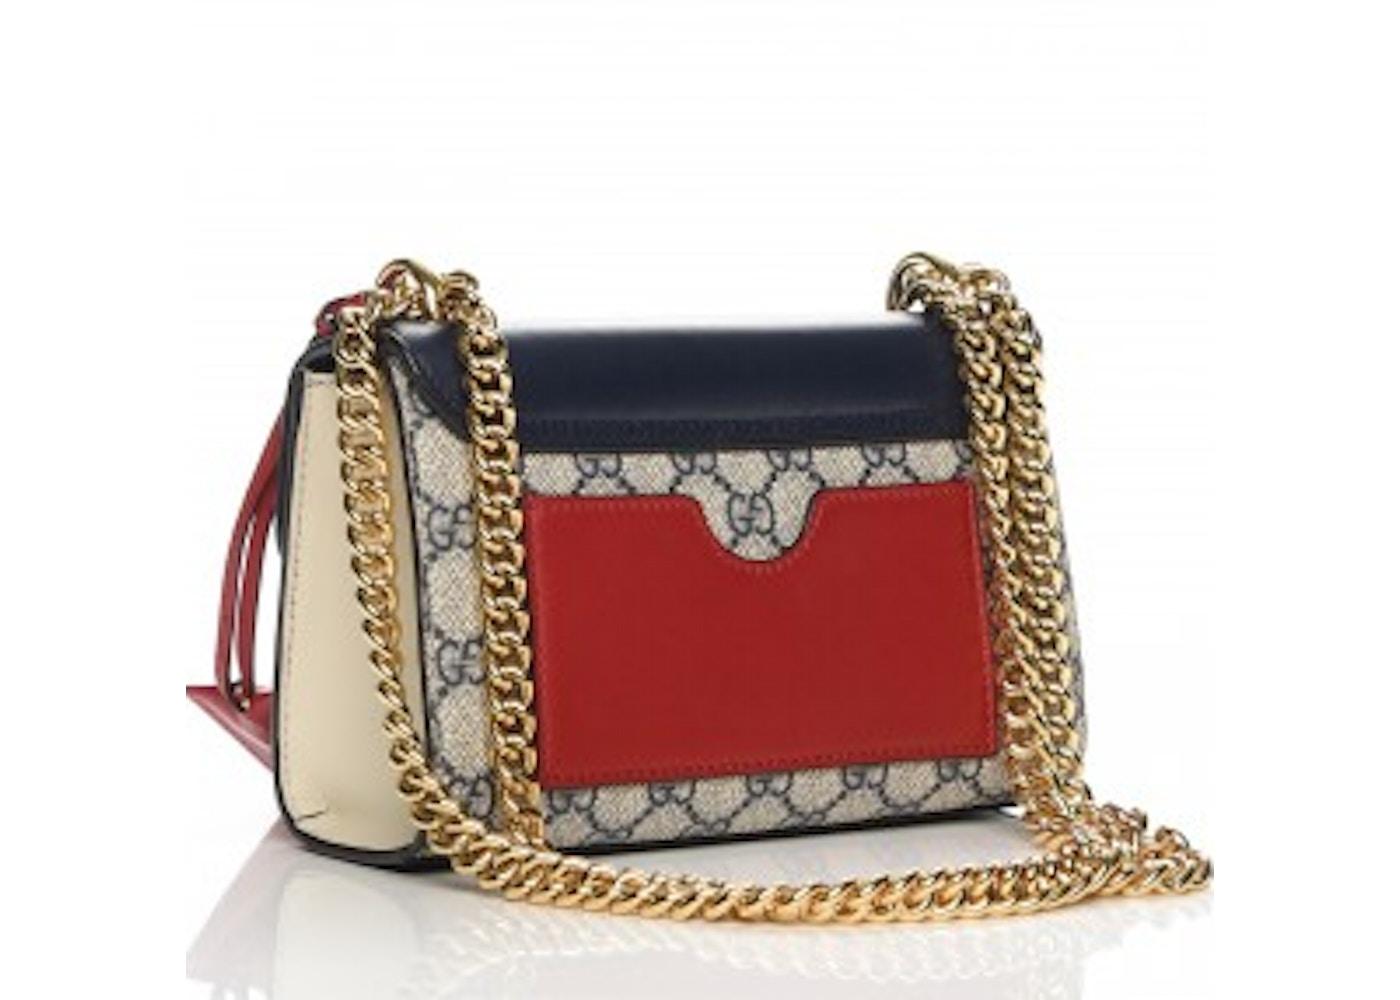 5177912a Gucci Padlock Shoulder Bag GG Supreme Monogram Push Lock Closure Open Small  Navy/Beige/Red